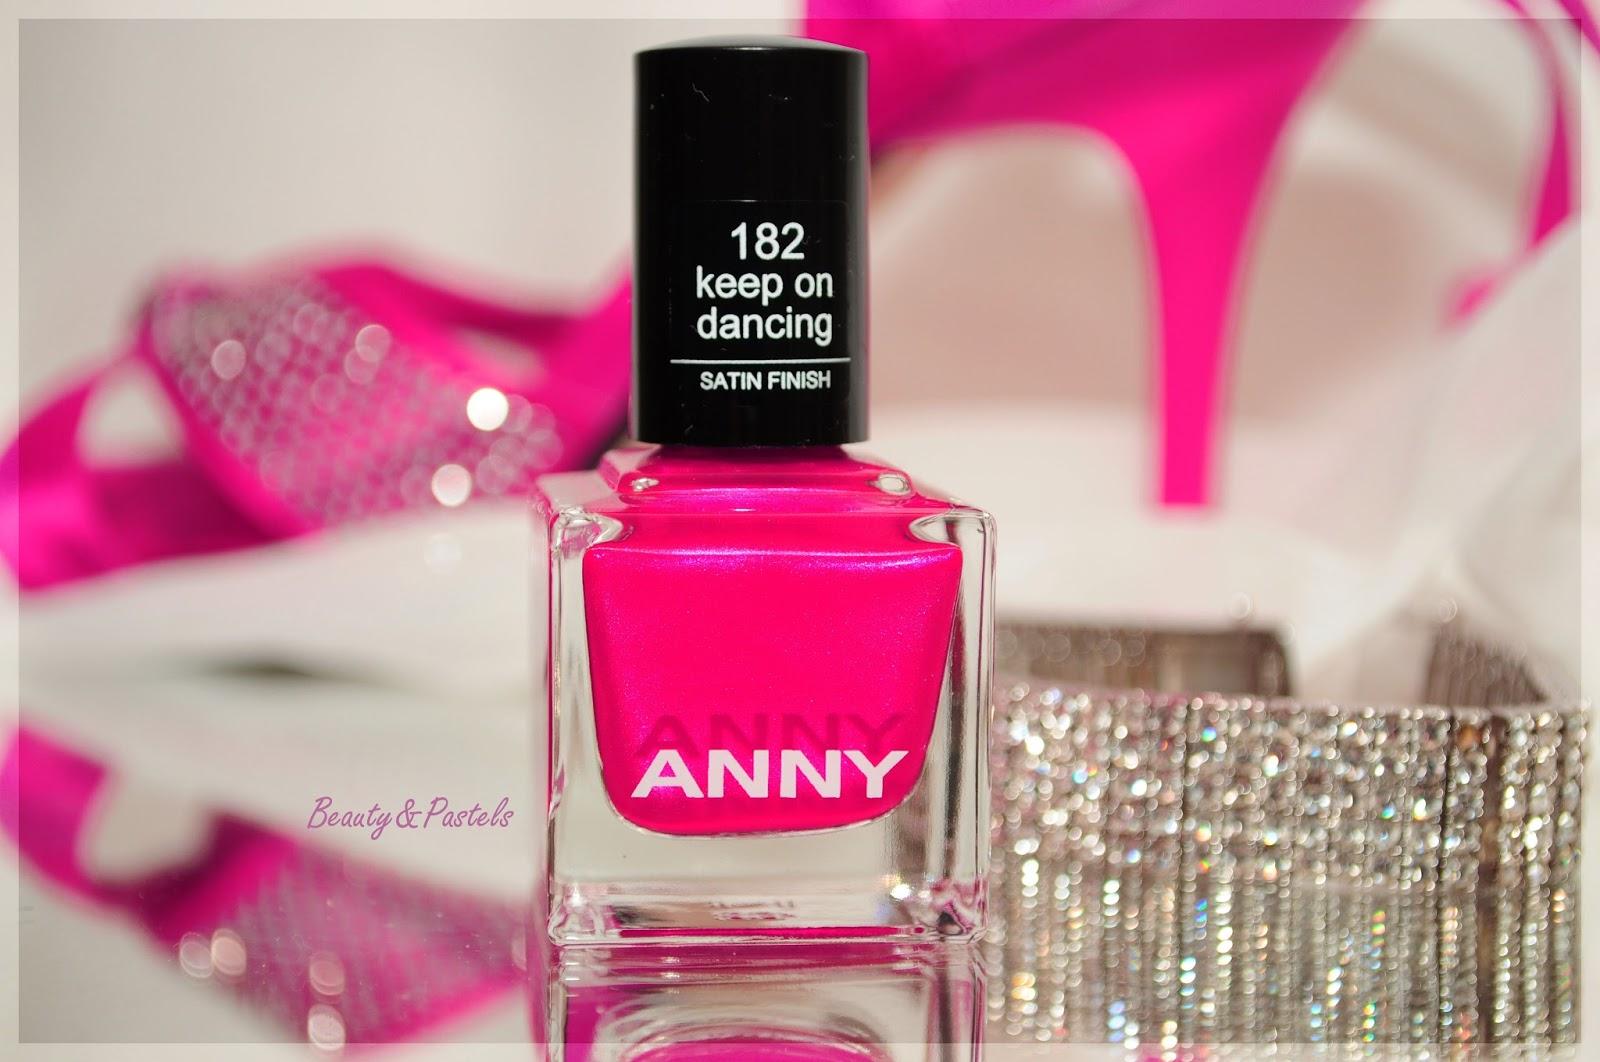 Anny-keep-on-dancing